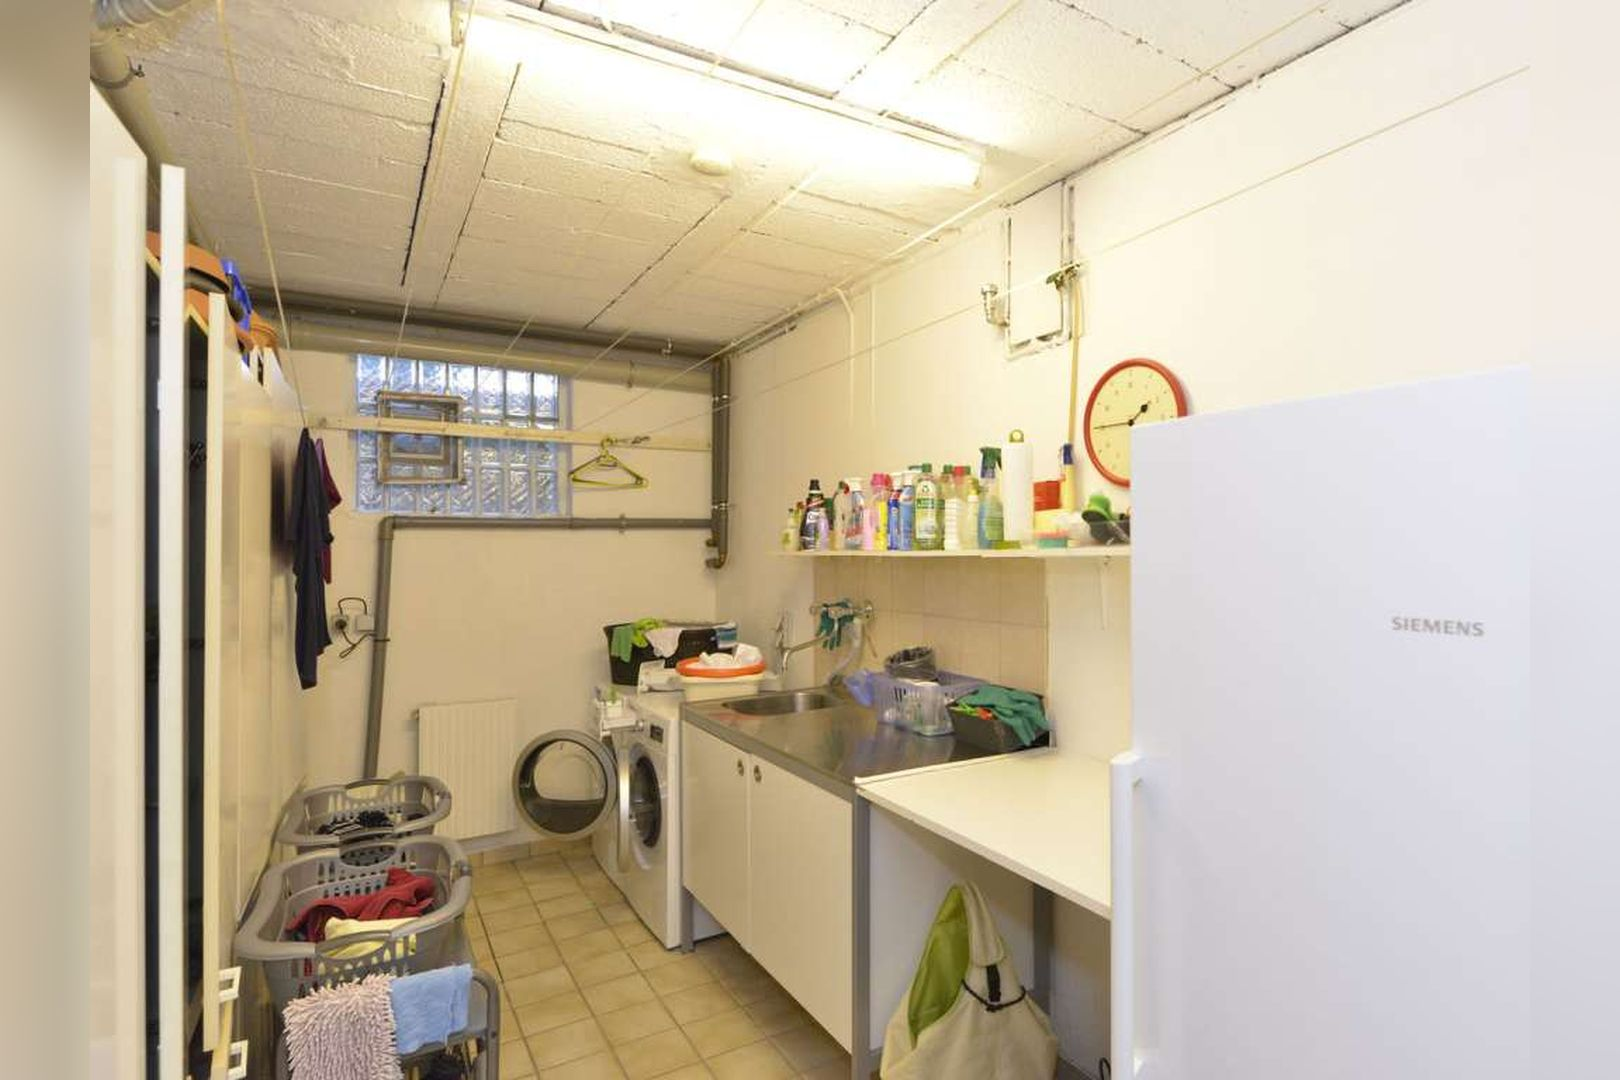 Immobilie Nr.0254 - Doppelhaushälfte rechtsbündig mit Garage & Carport  - Bild 18.jpg